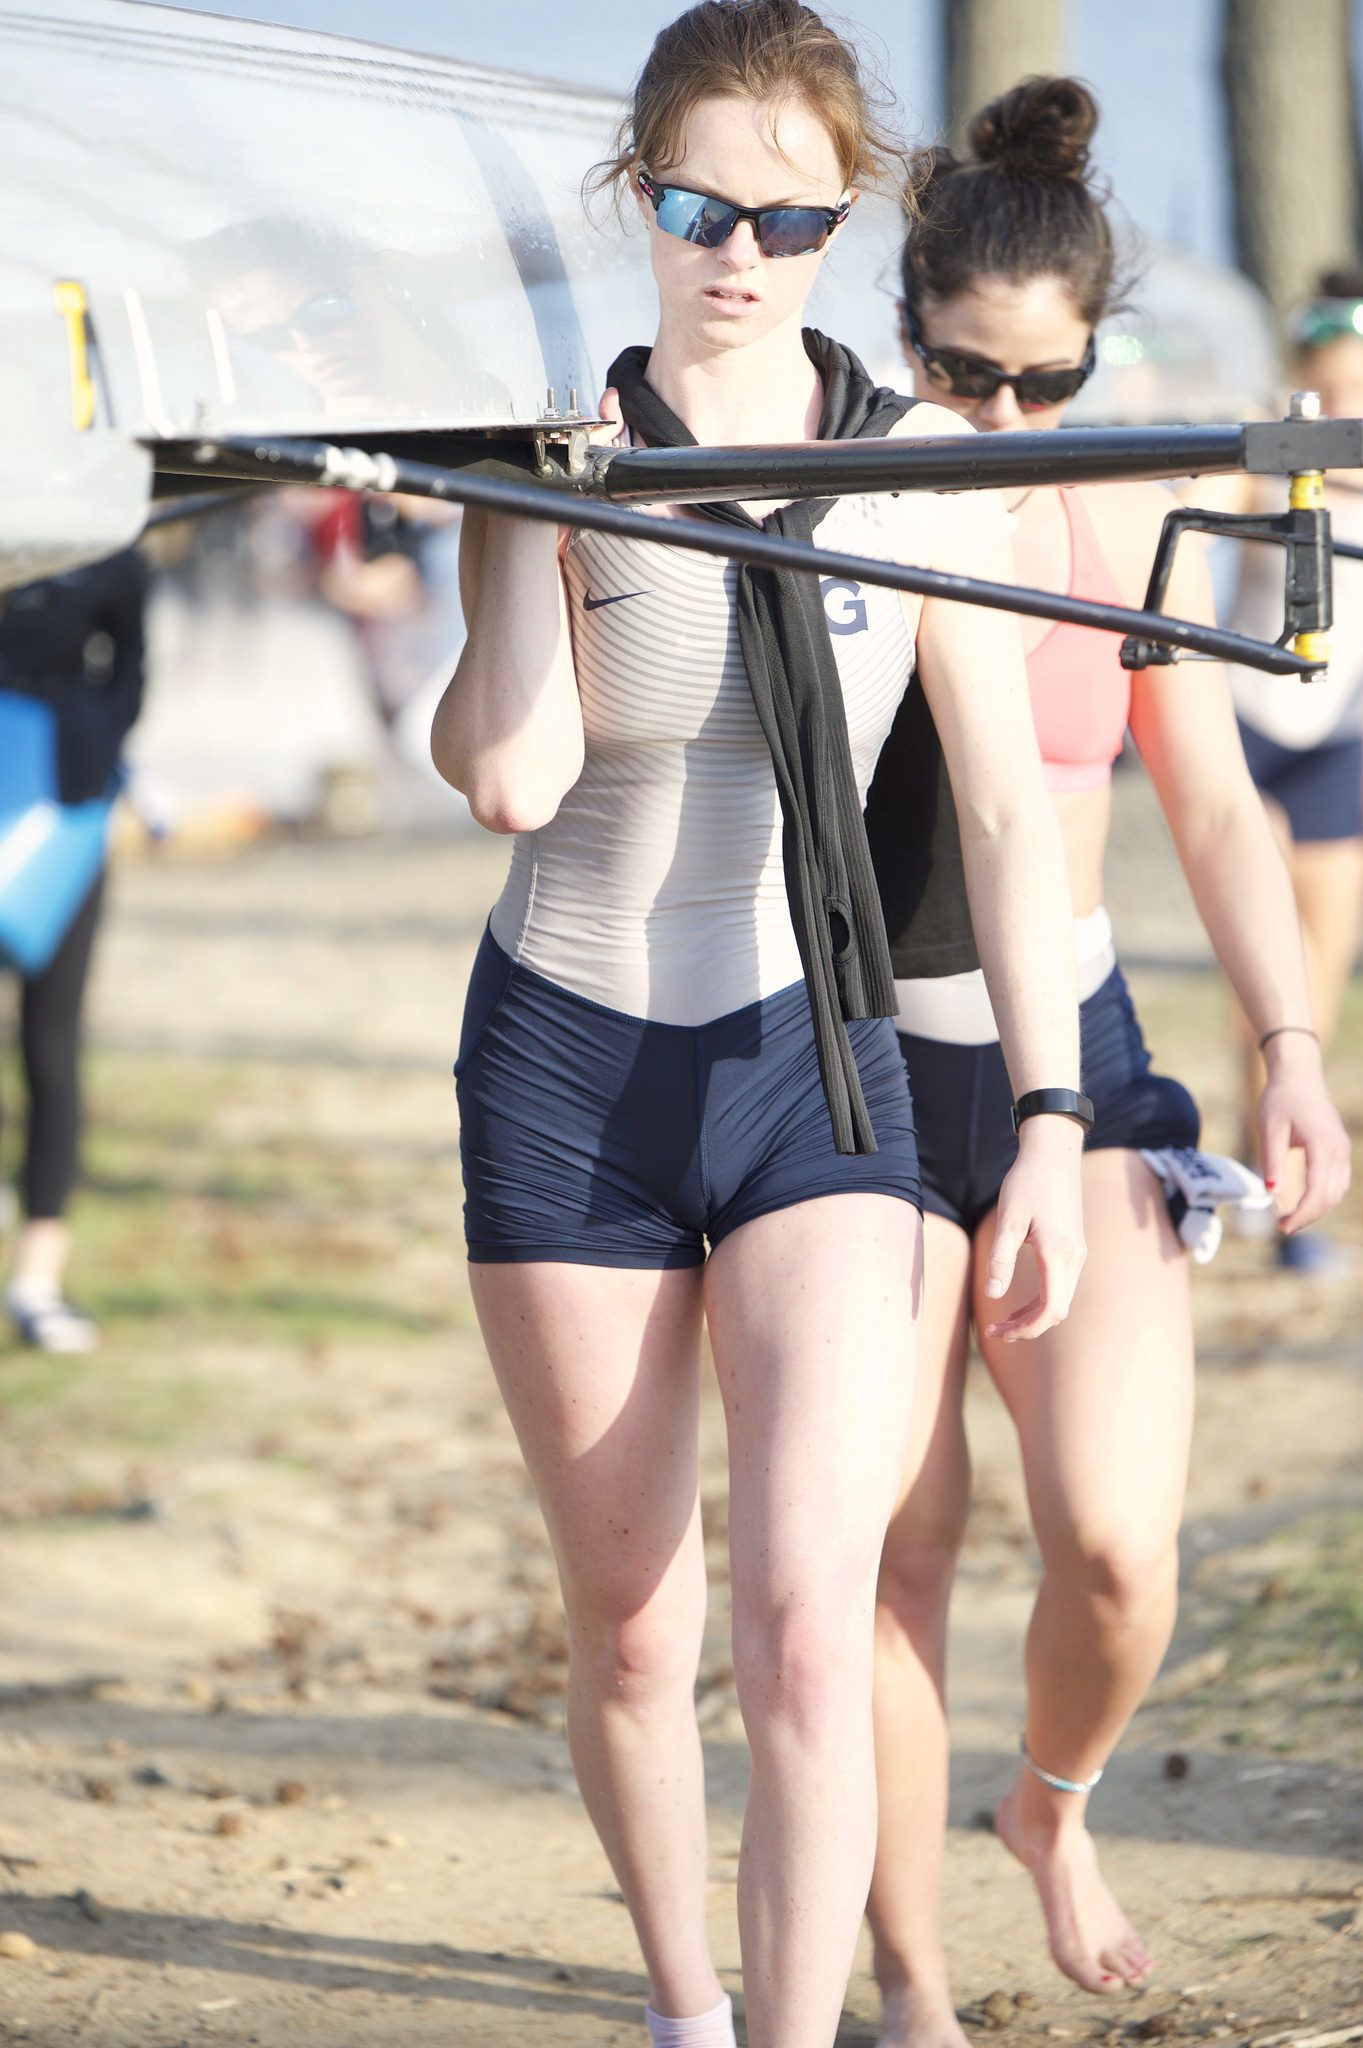 candid rowing girls vol. 11 | powis | powis - power of women in